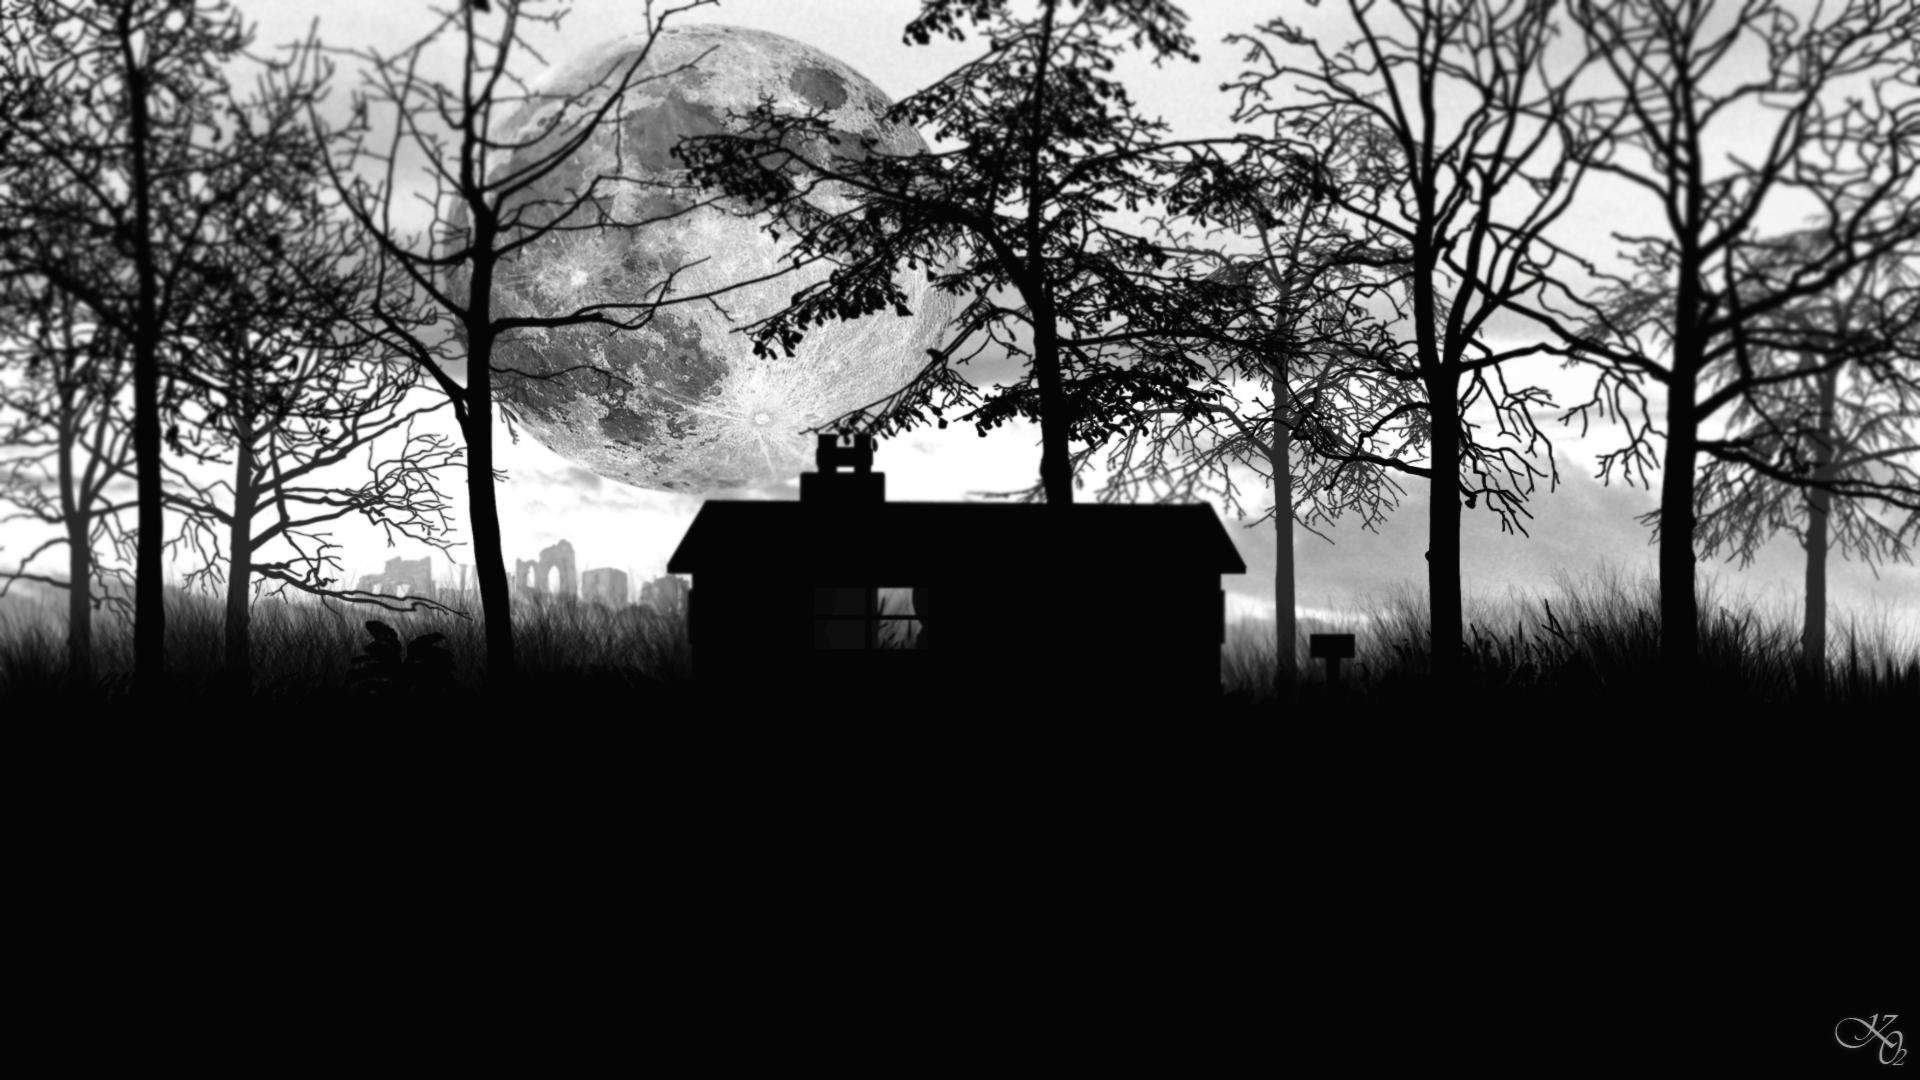 Wallpapers Digital Art Black & White forestier